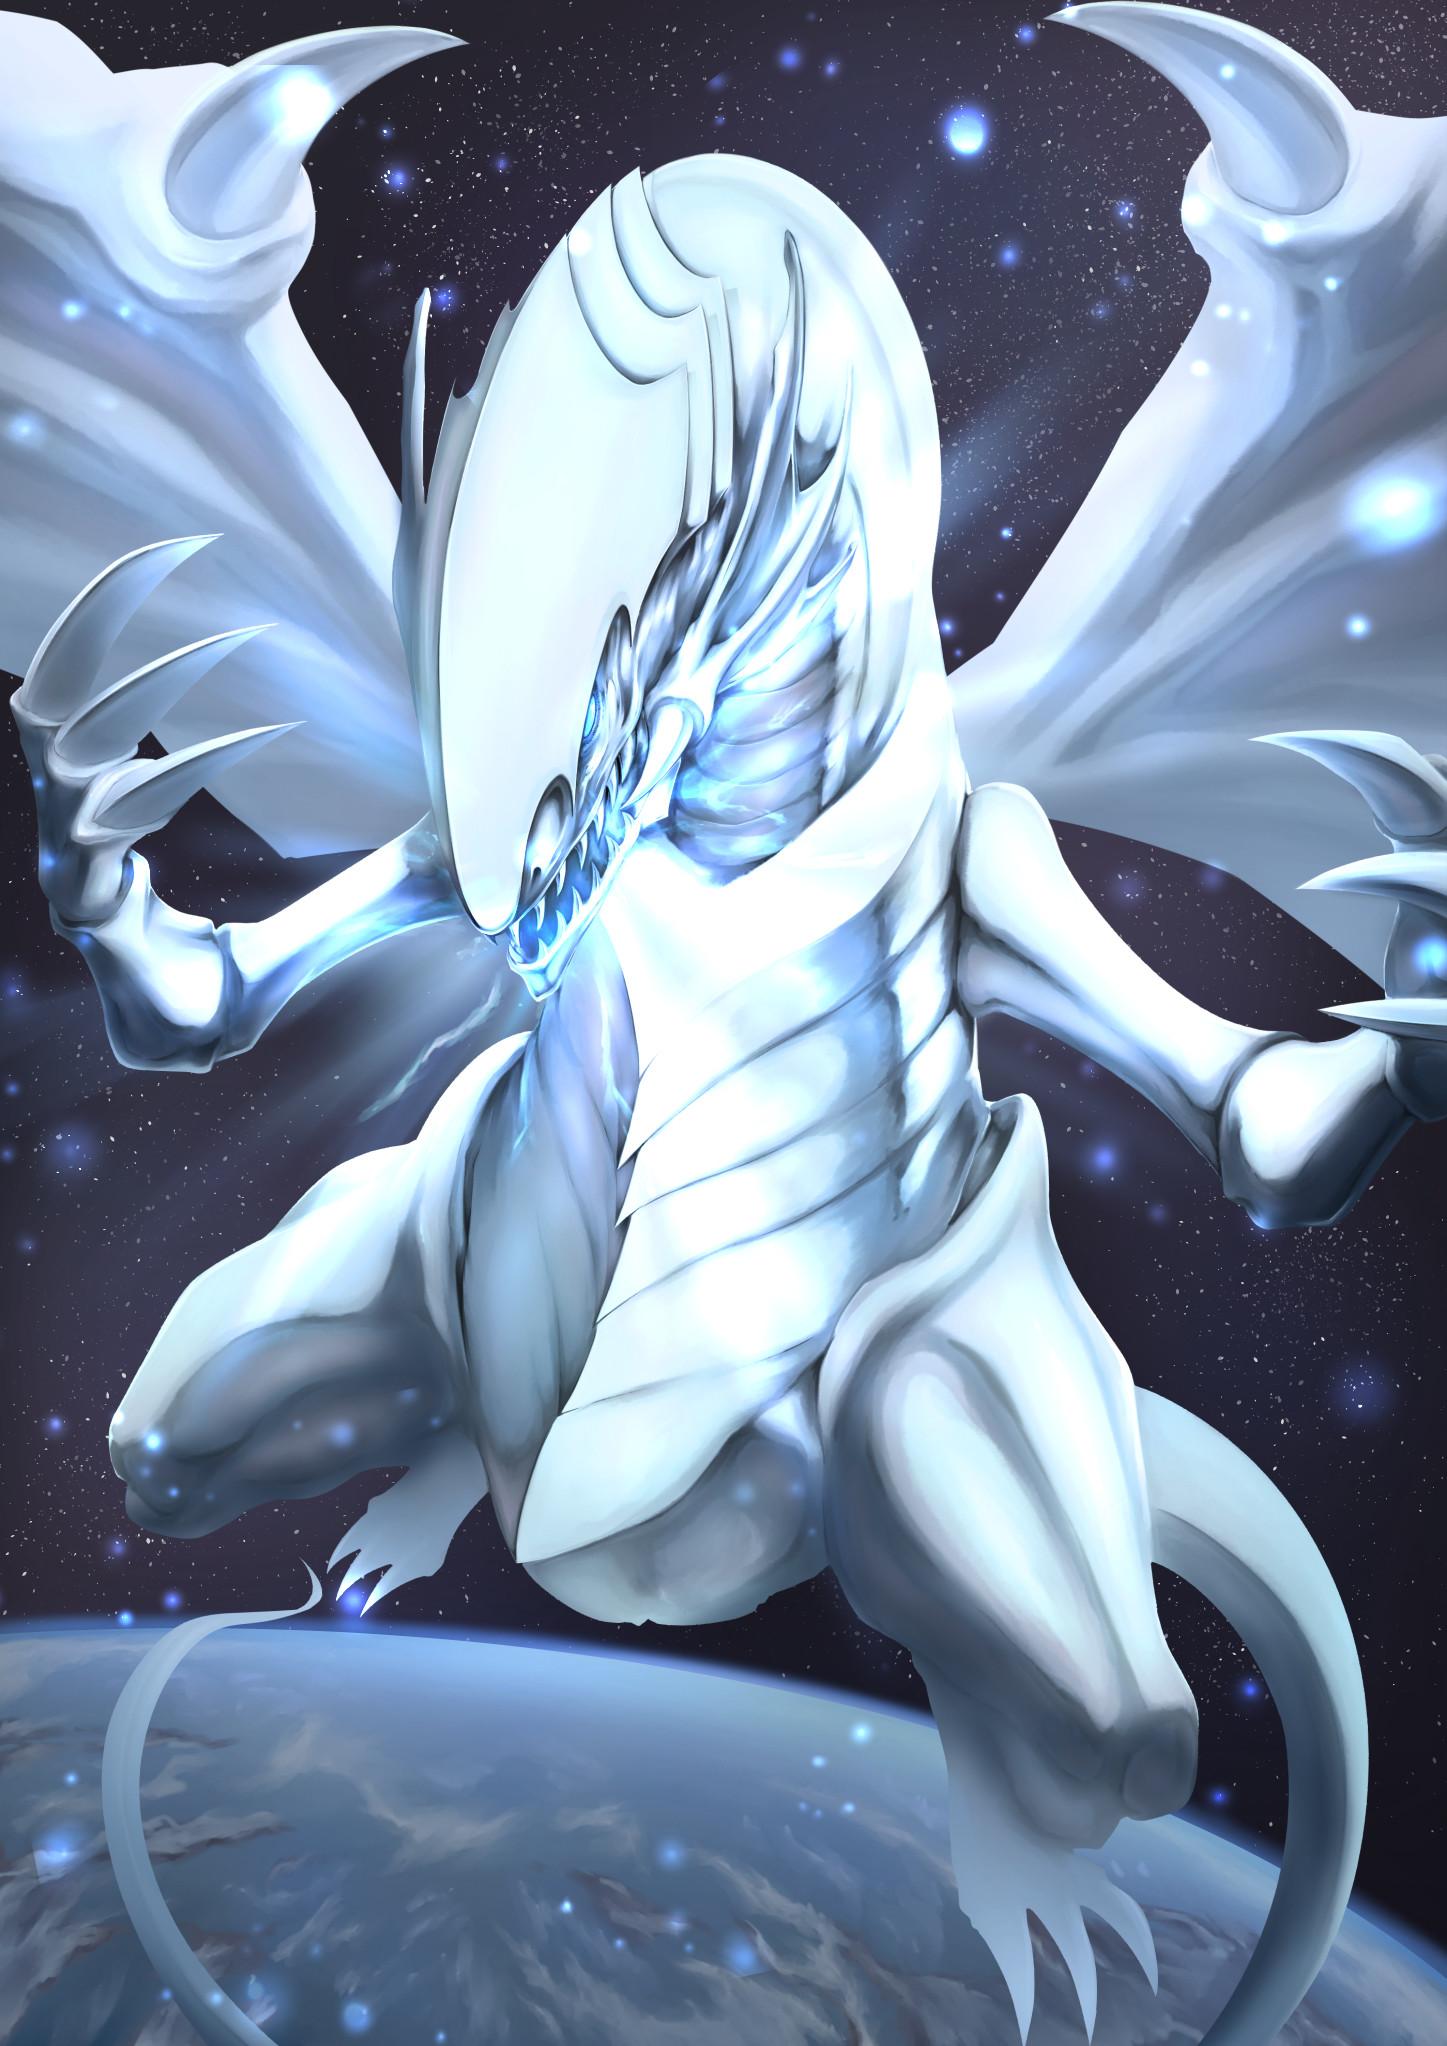 Blue-Eyes White Dragon download Blue-Eyes White Dragon image